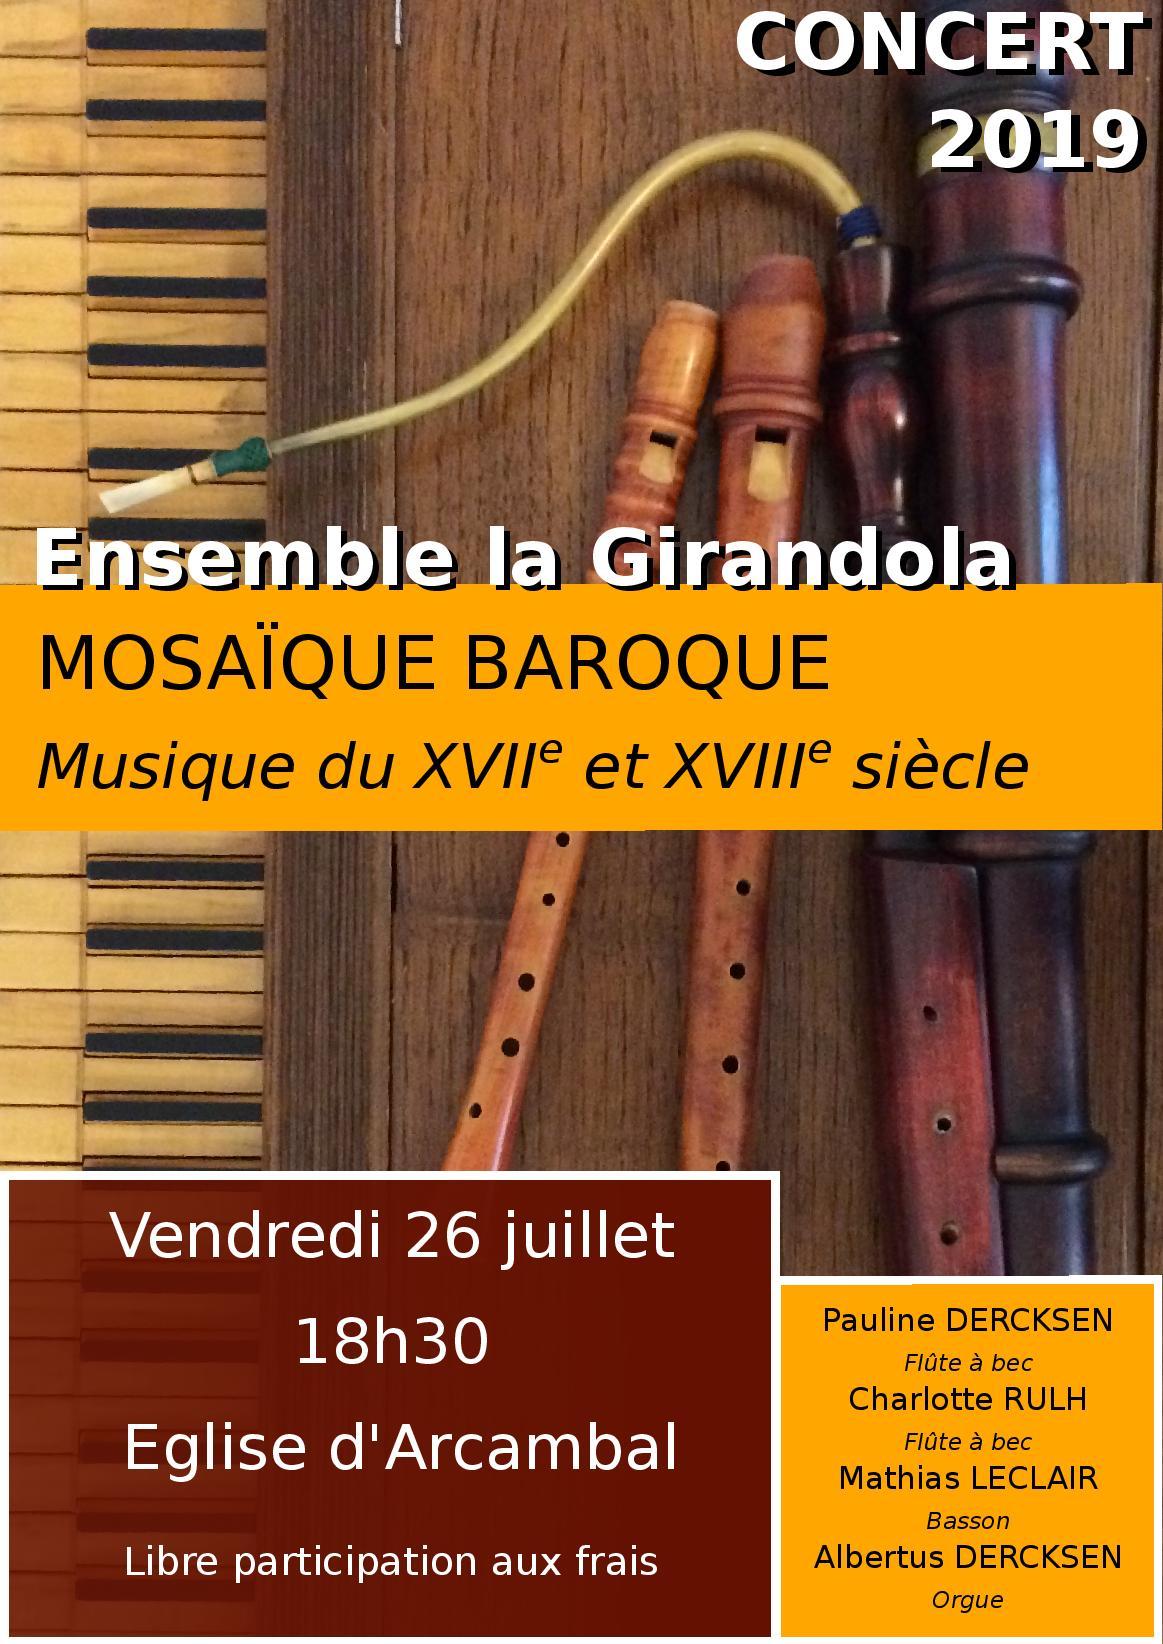 Figeac : Concert de Musique Baroque